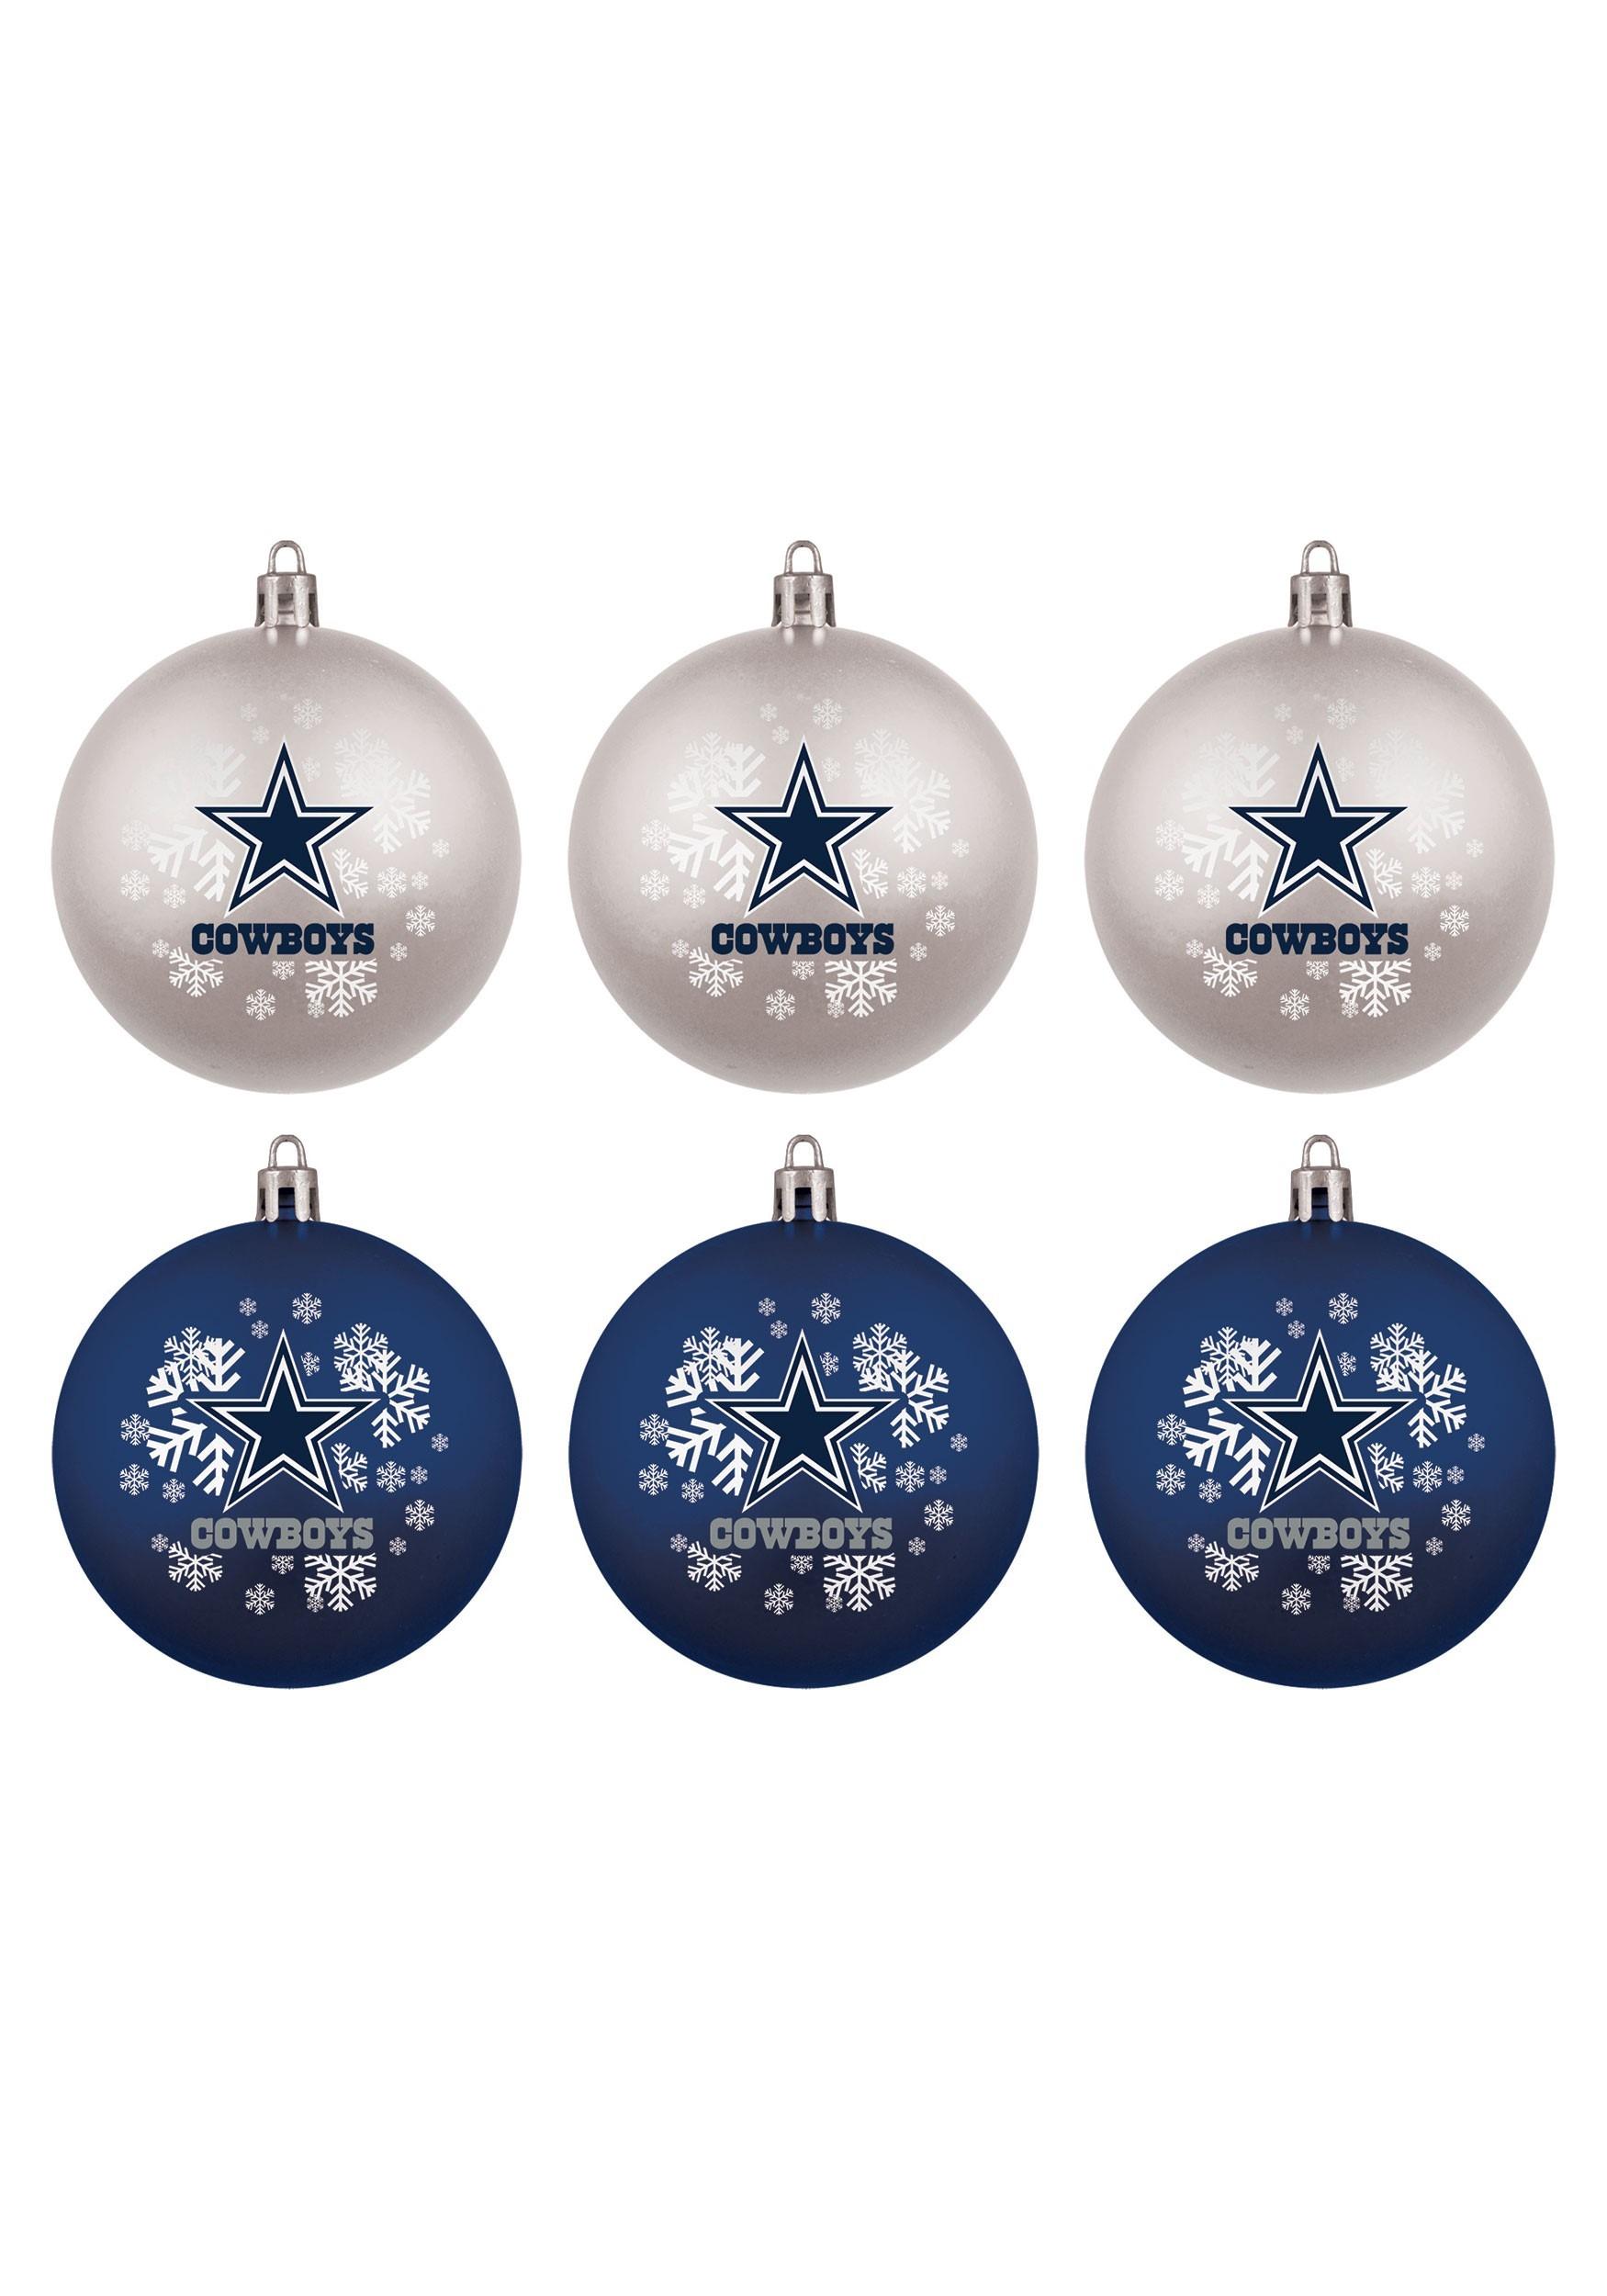 Dallas cowboys shatterproof ornament 6 pack set